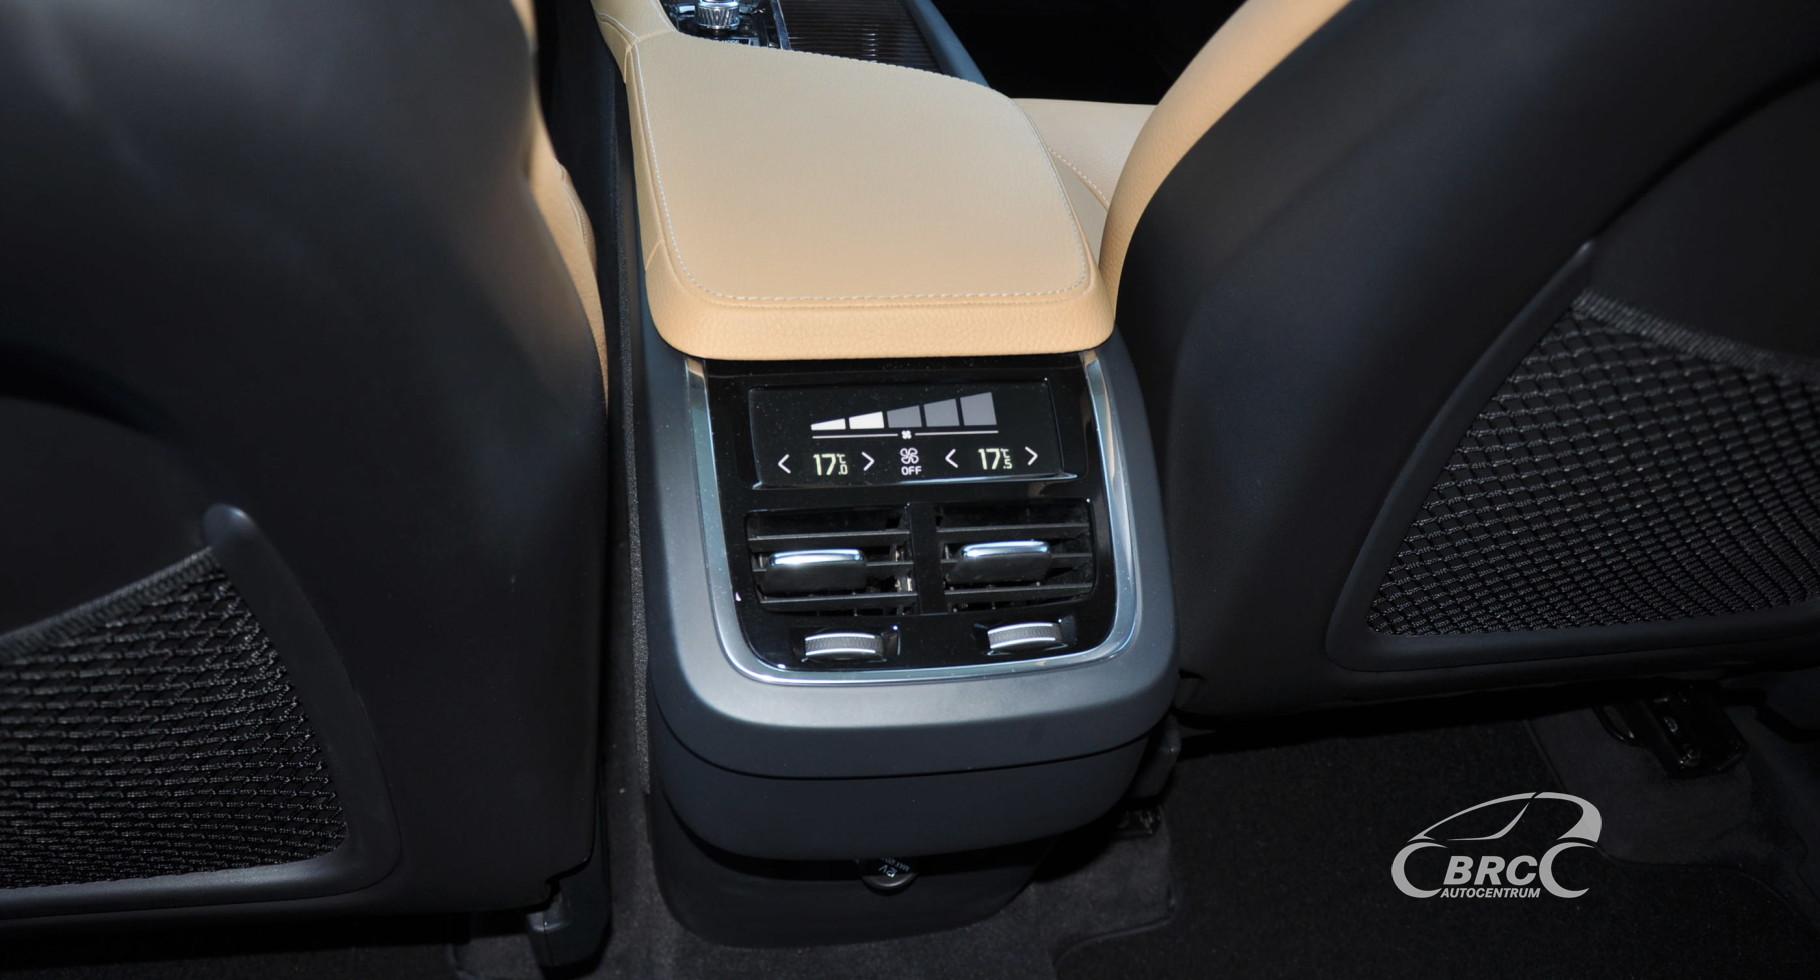 Volvo XC 90 2.0 T6 AWD Automatas